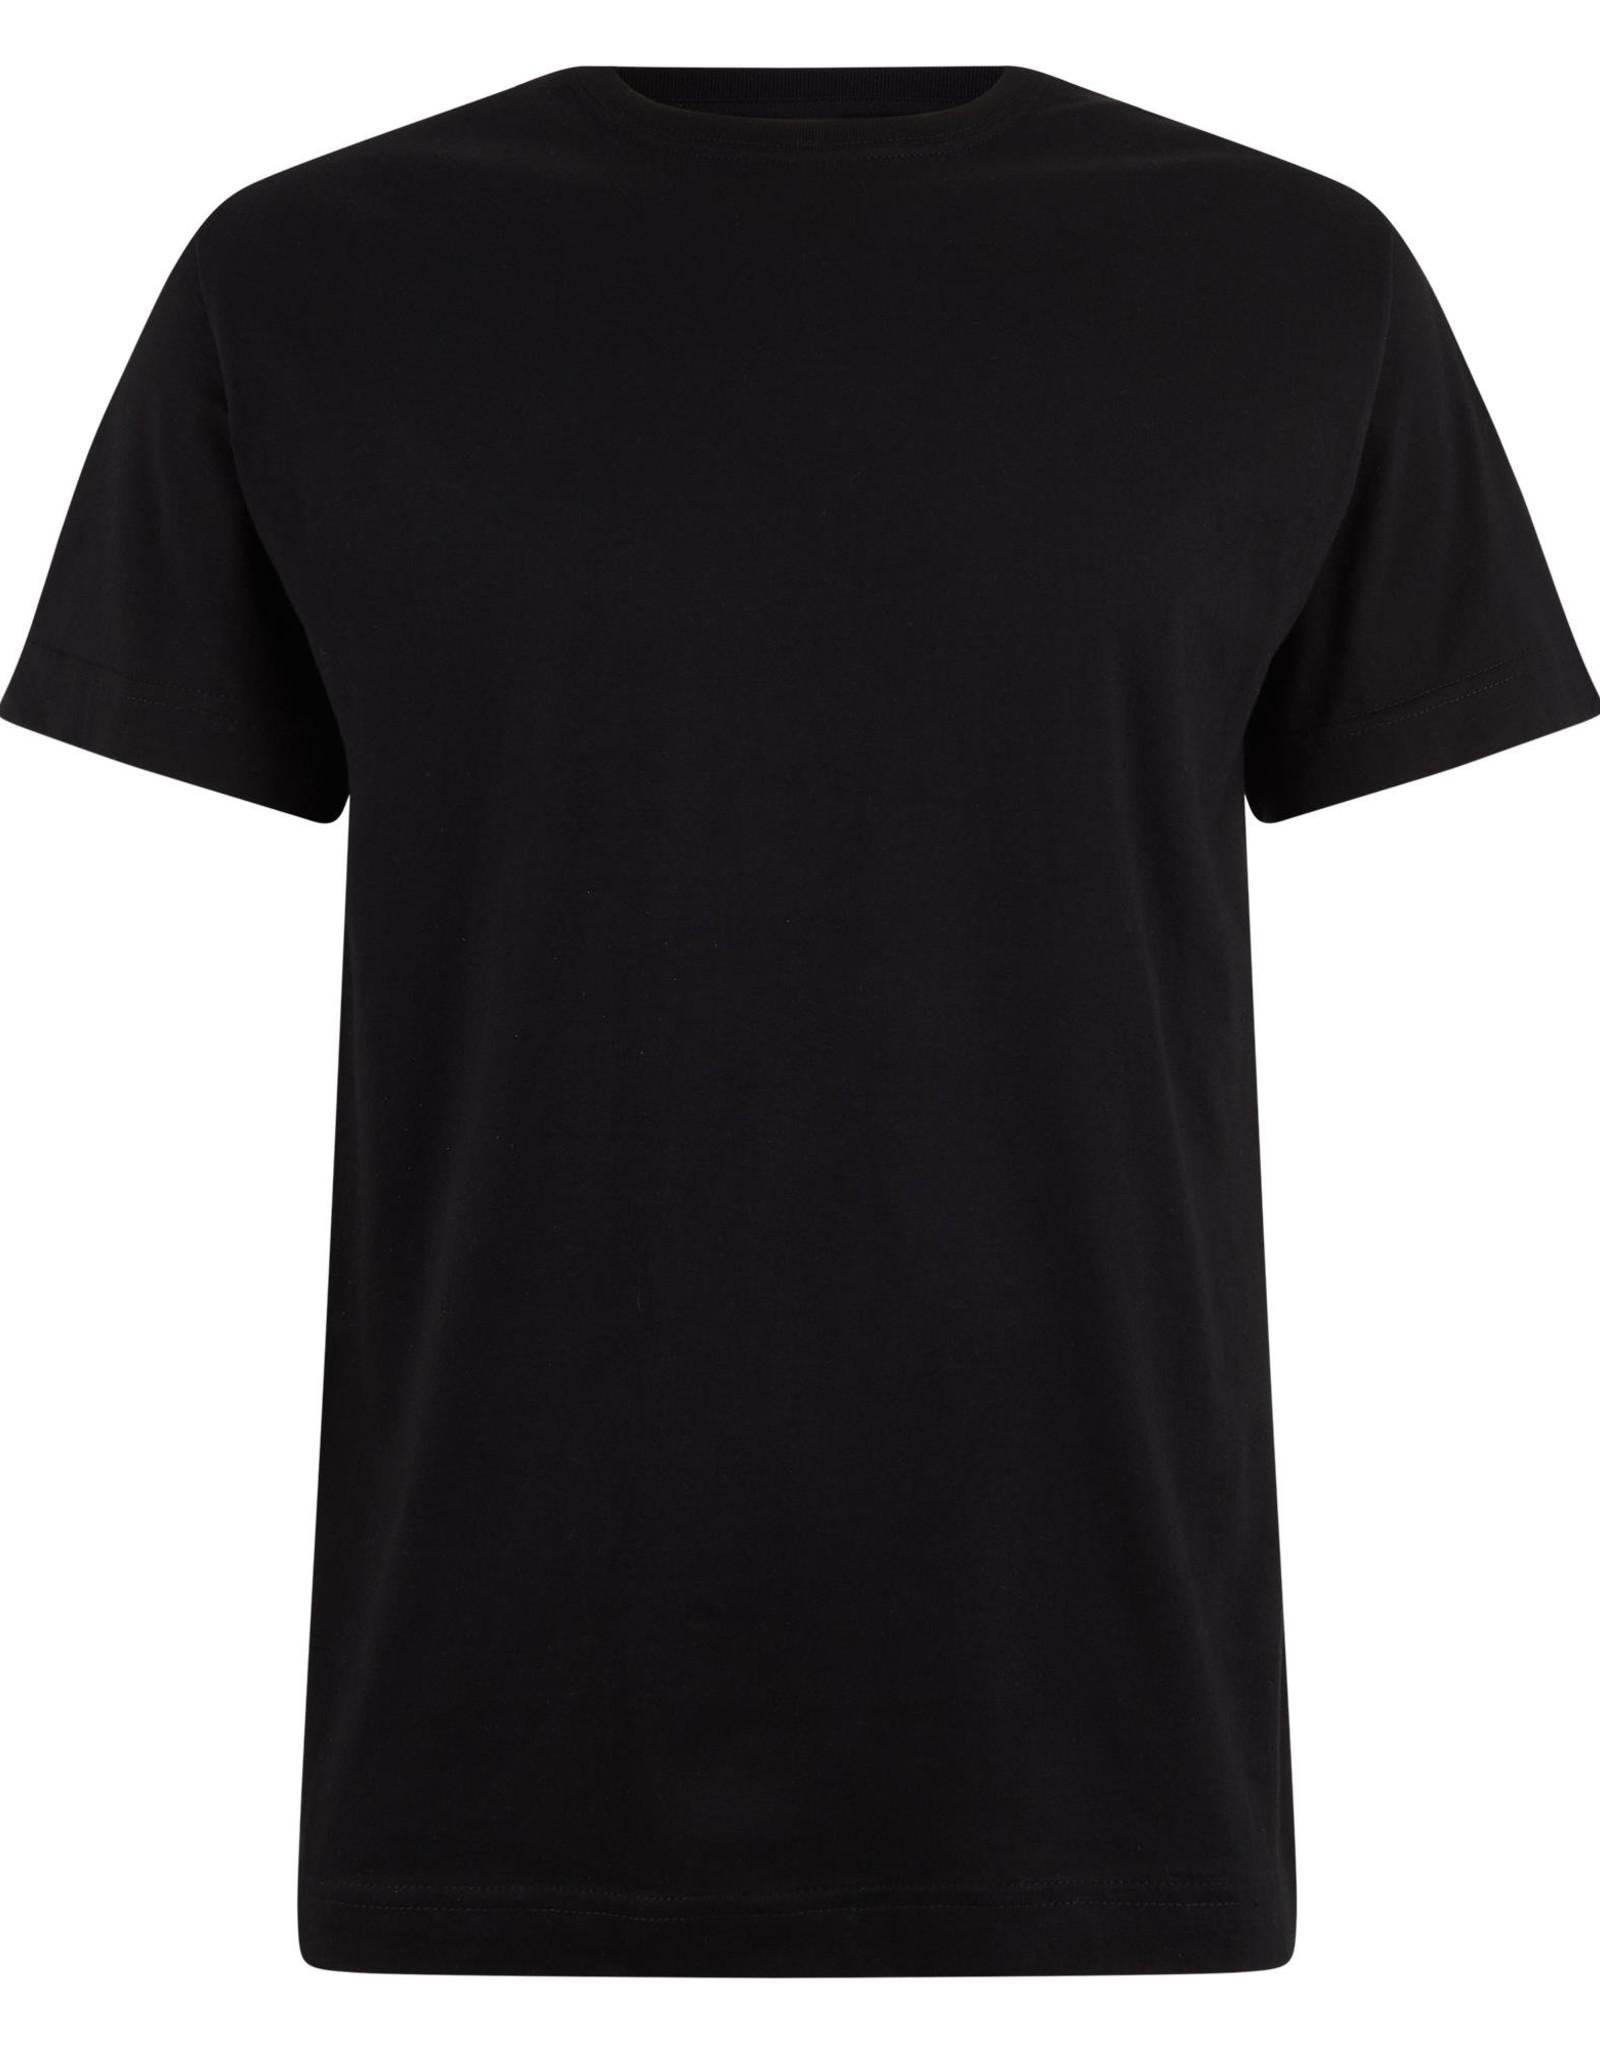 Logostar T-SHIRT basic met ronde hals zwart